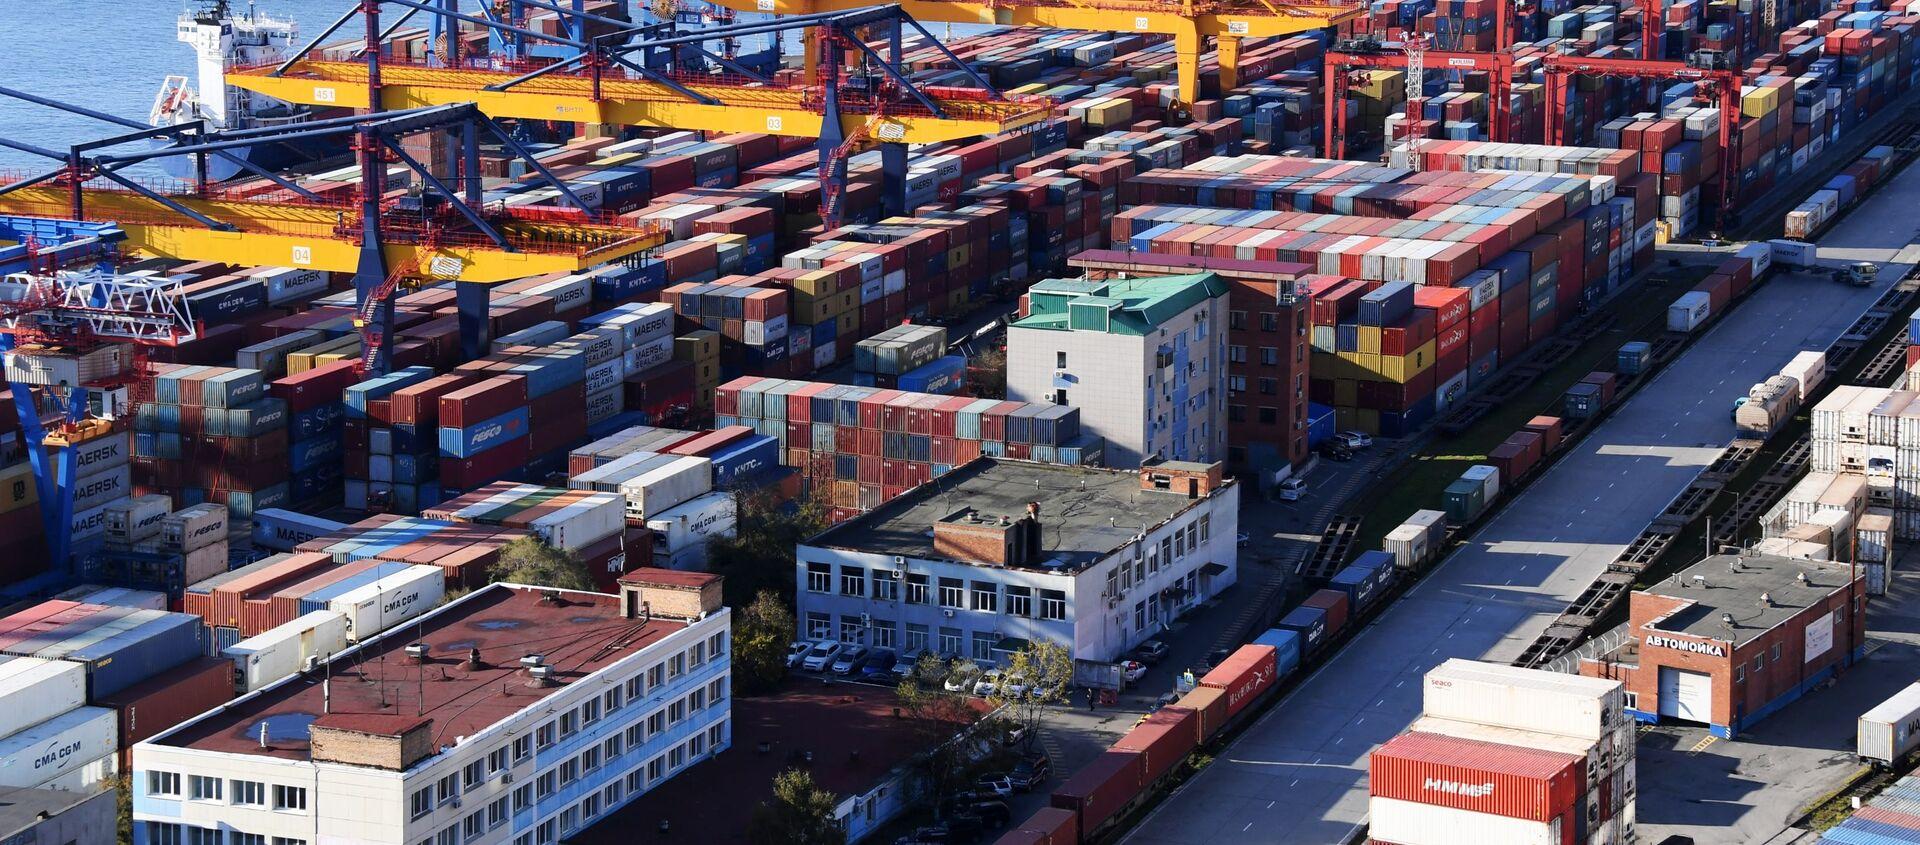 Vladivostok Commercial Port. File photo. - Sputnik International, 1920, 30.08.2021